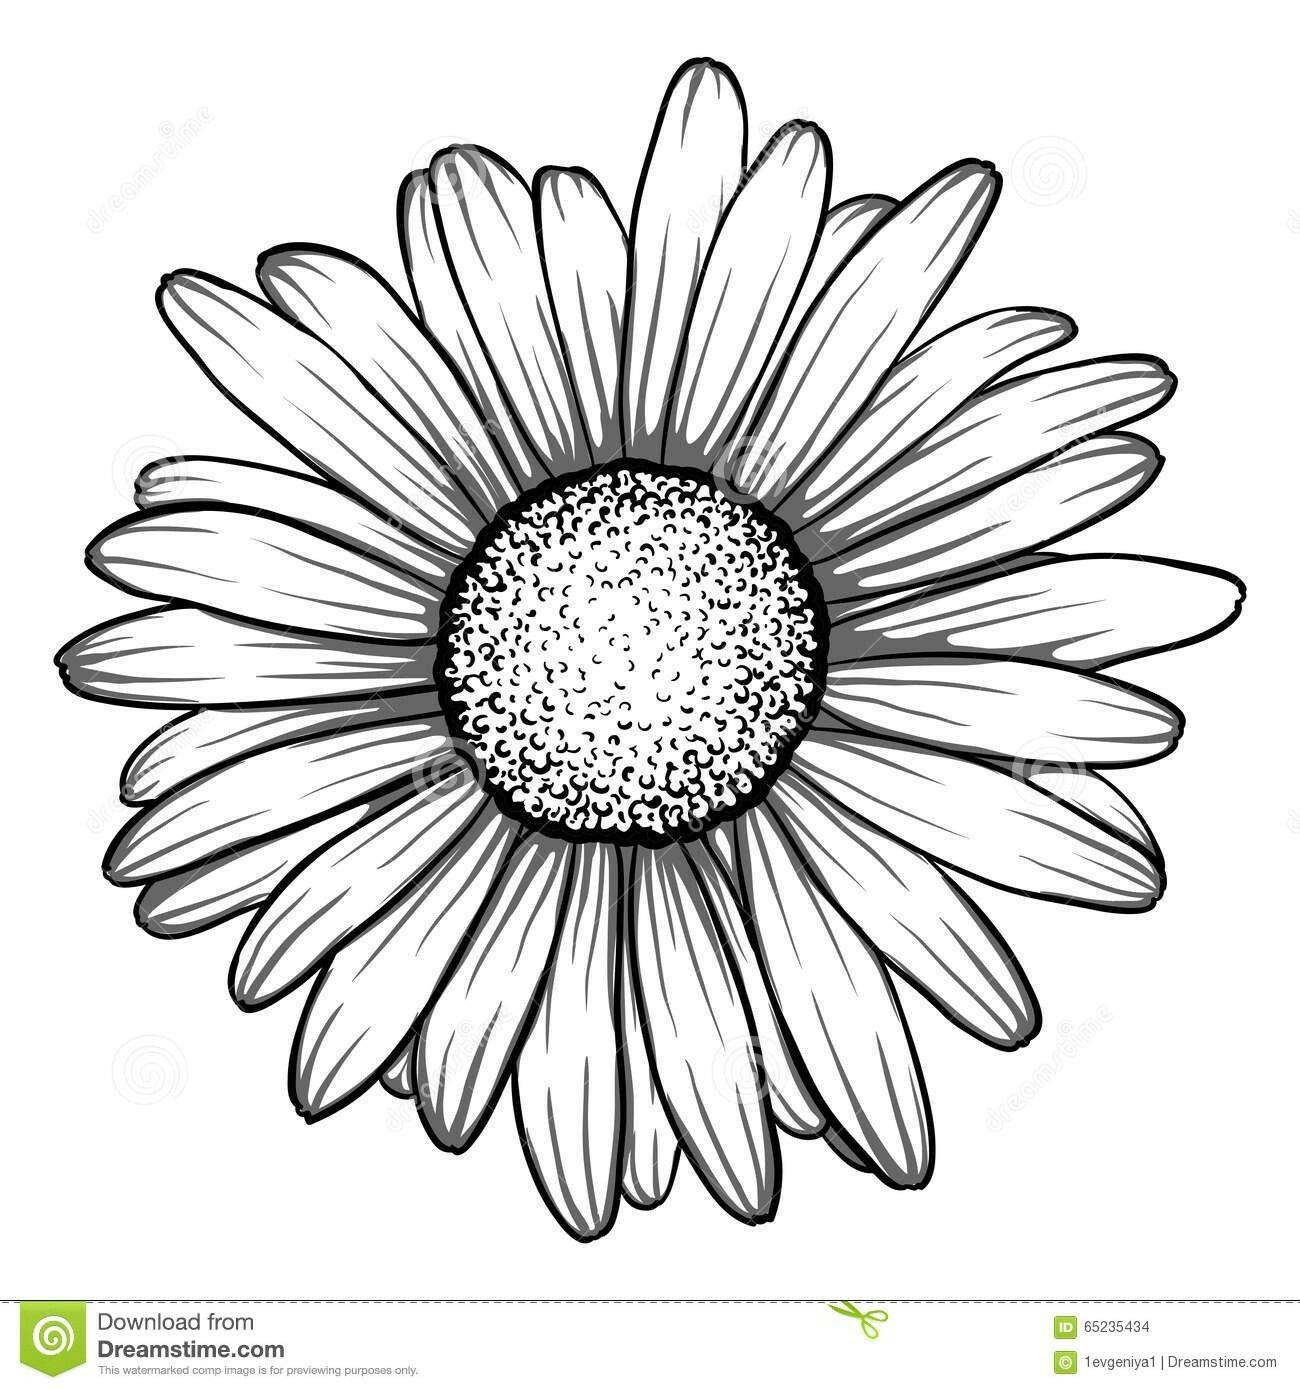 Pin By רותם אילוז On Tattoo With Images Daisy Tattoo Daisy